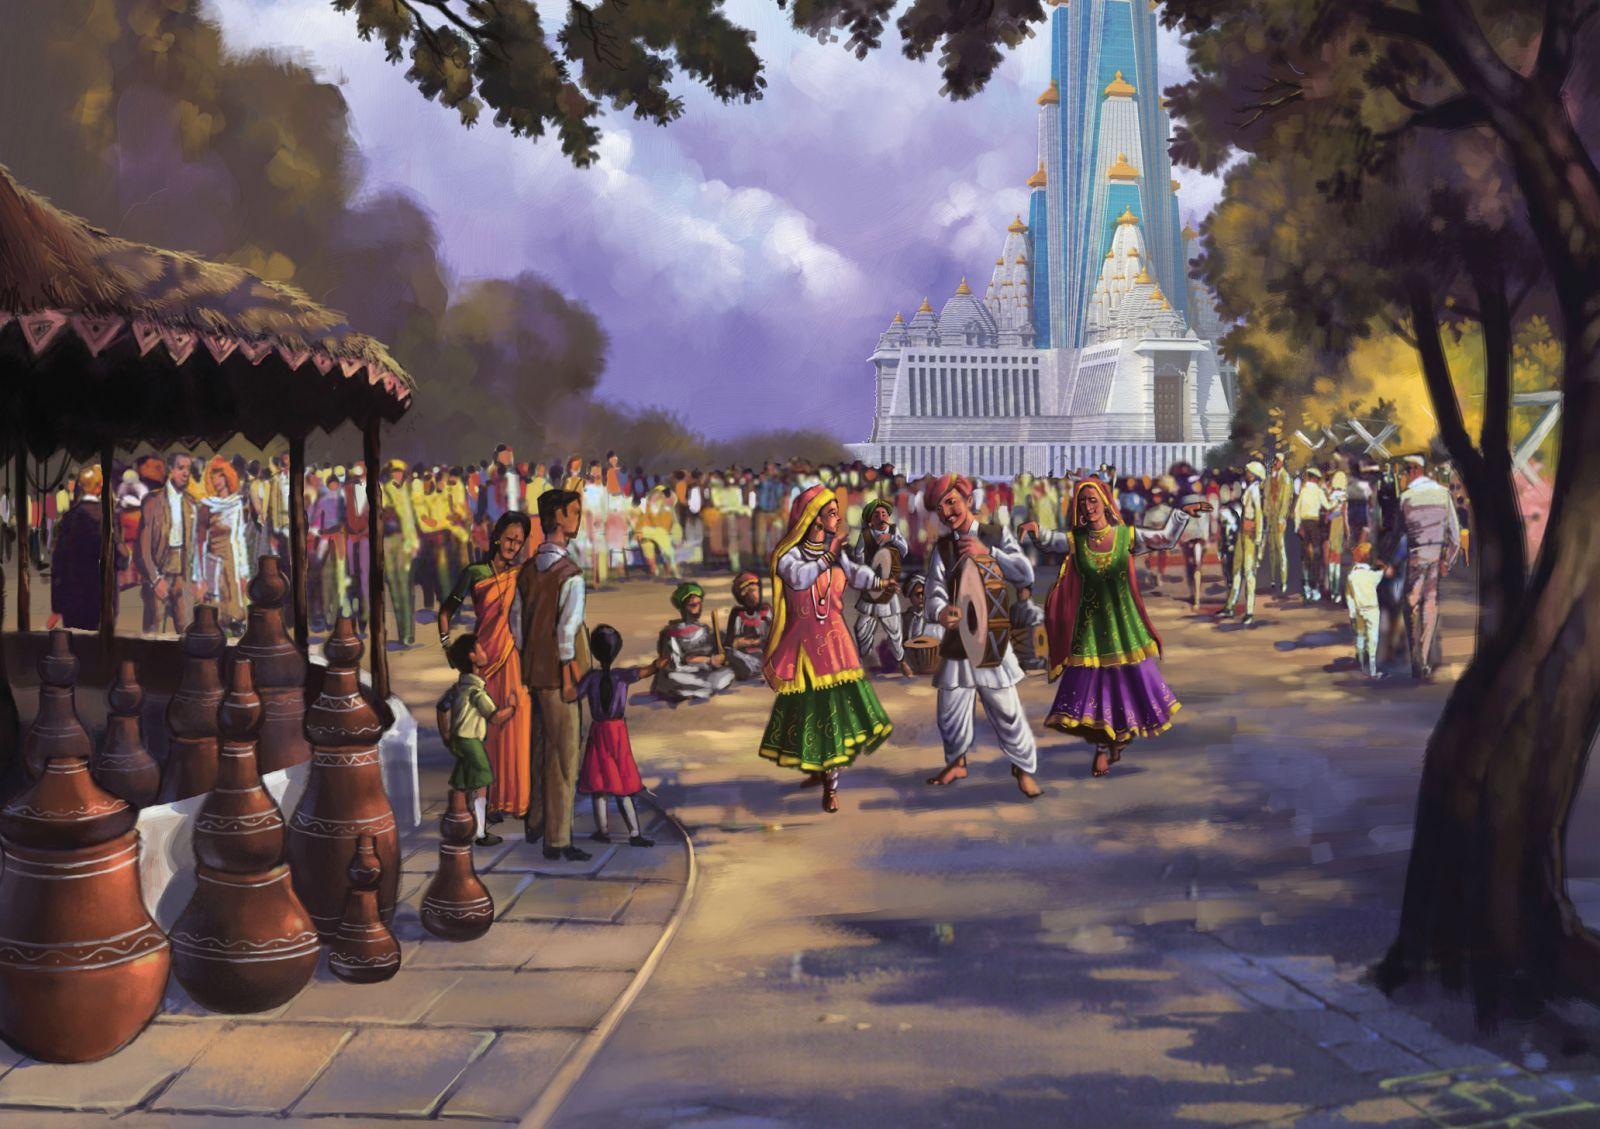 Vrindavan Chandrodaya Mandir